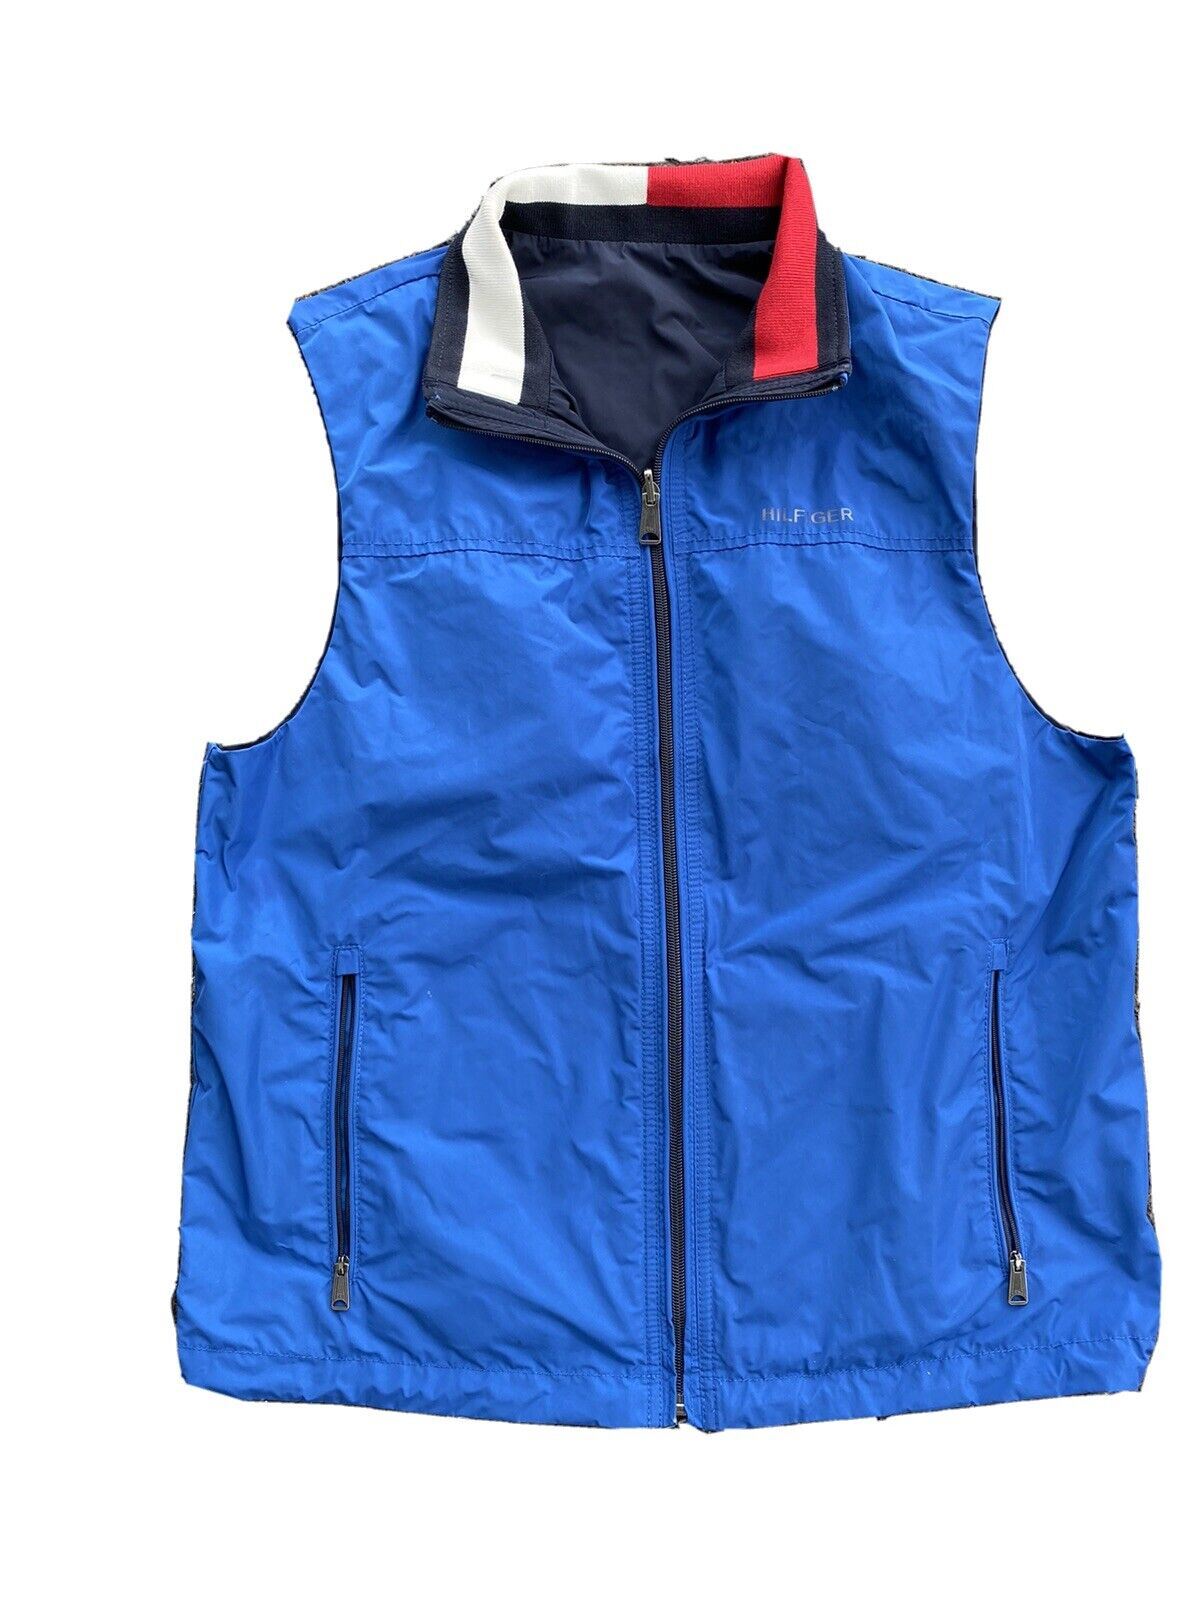 Tommy Hilfiger Lightweight Sleeveless Jacket Oute… - image 1